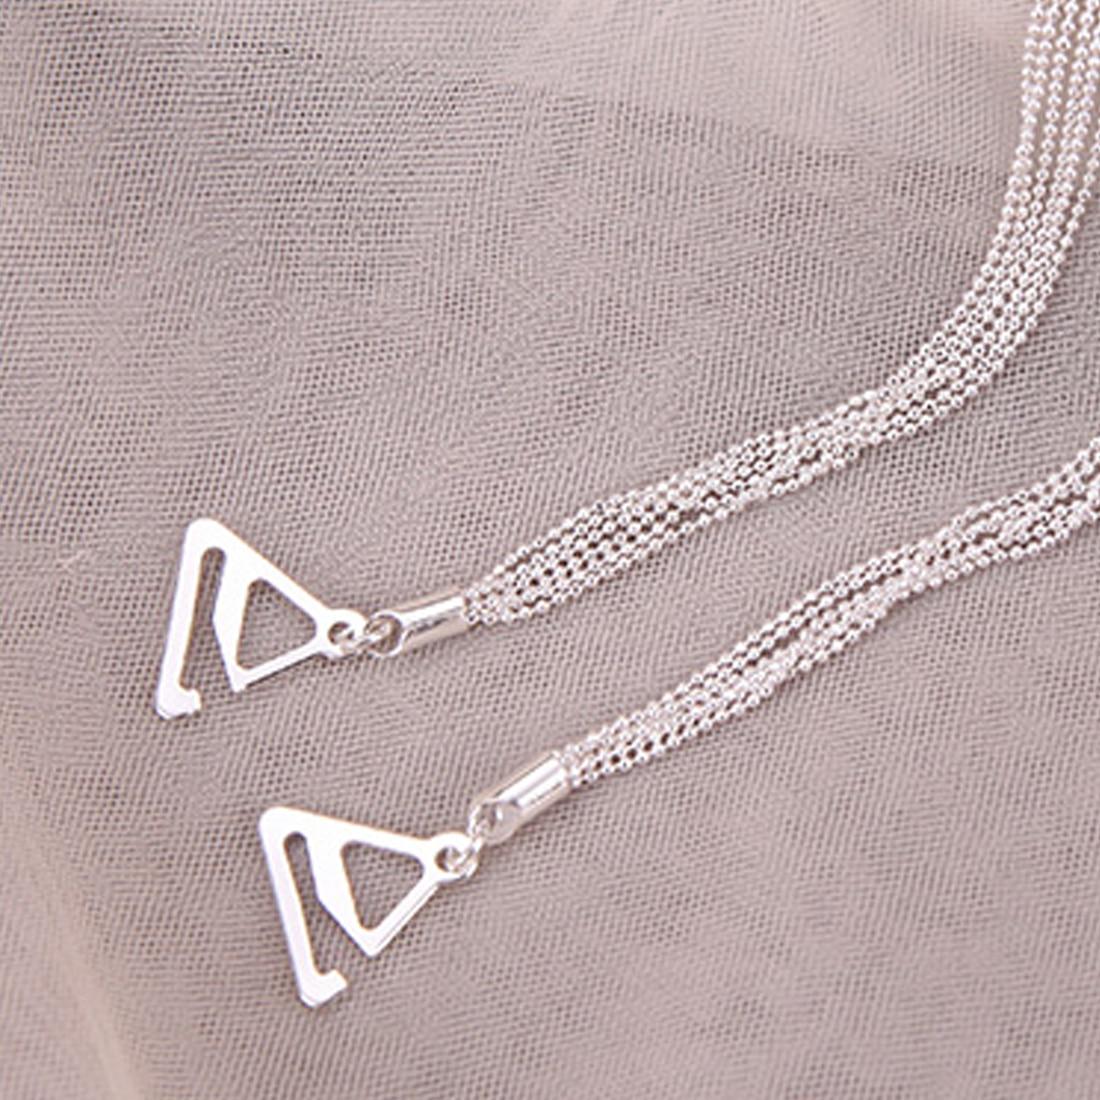 Tassel Metal Shoulder Strap Shoulder Underwear Bra Dress Decor Straps 8C